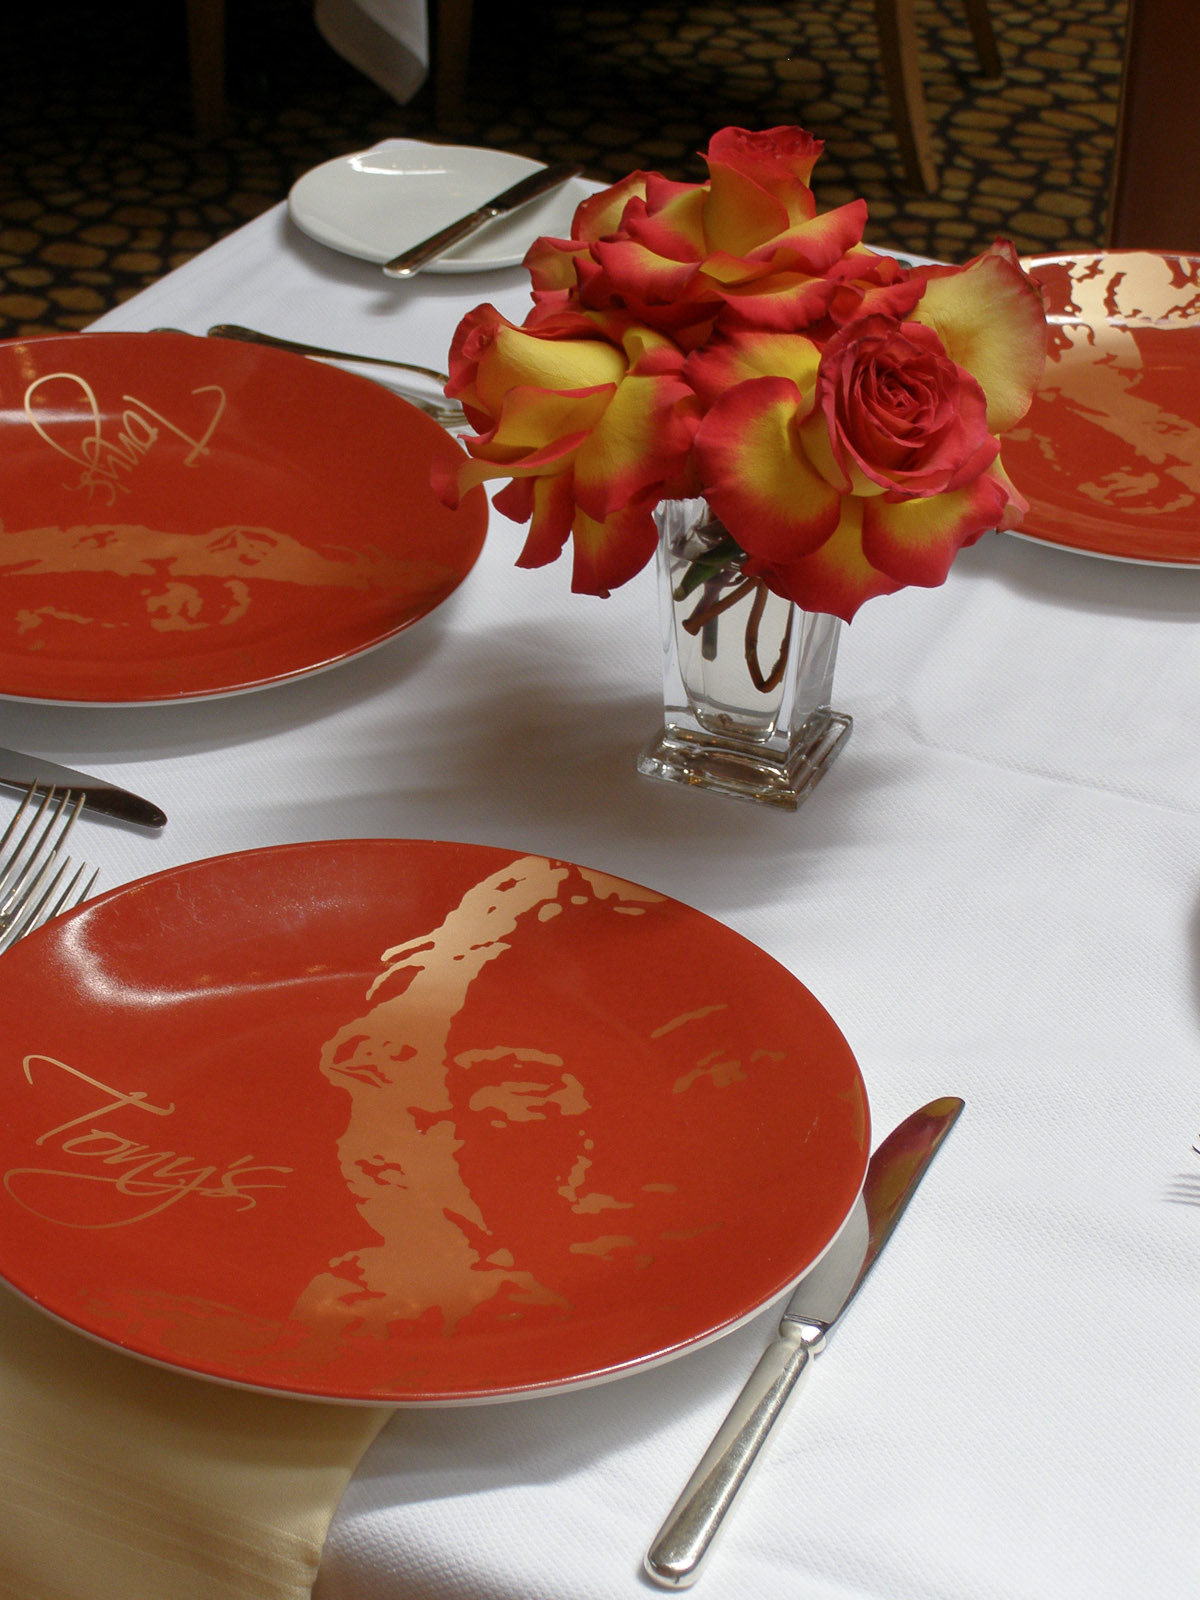 News_Tony's_restaurant_table setting